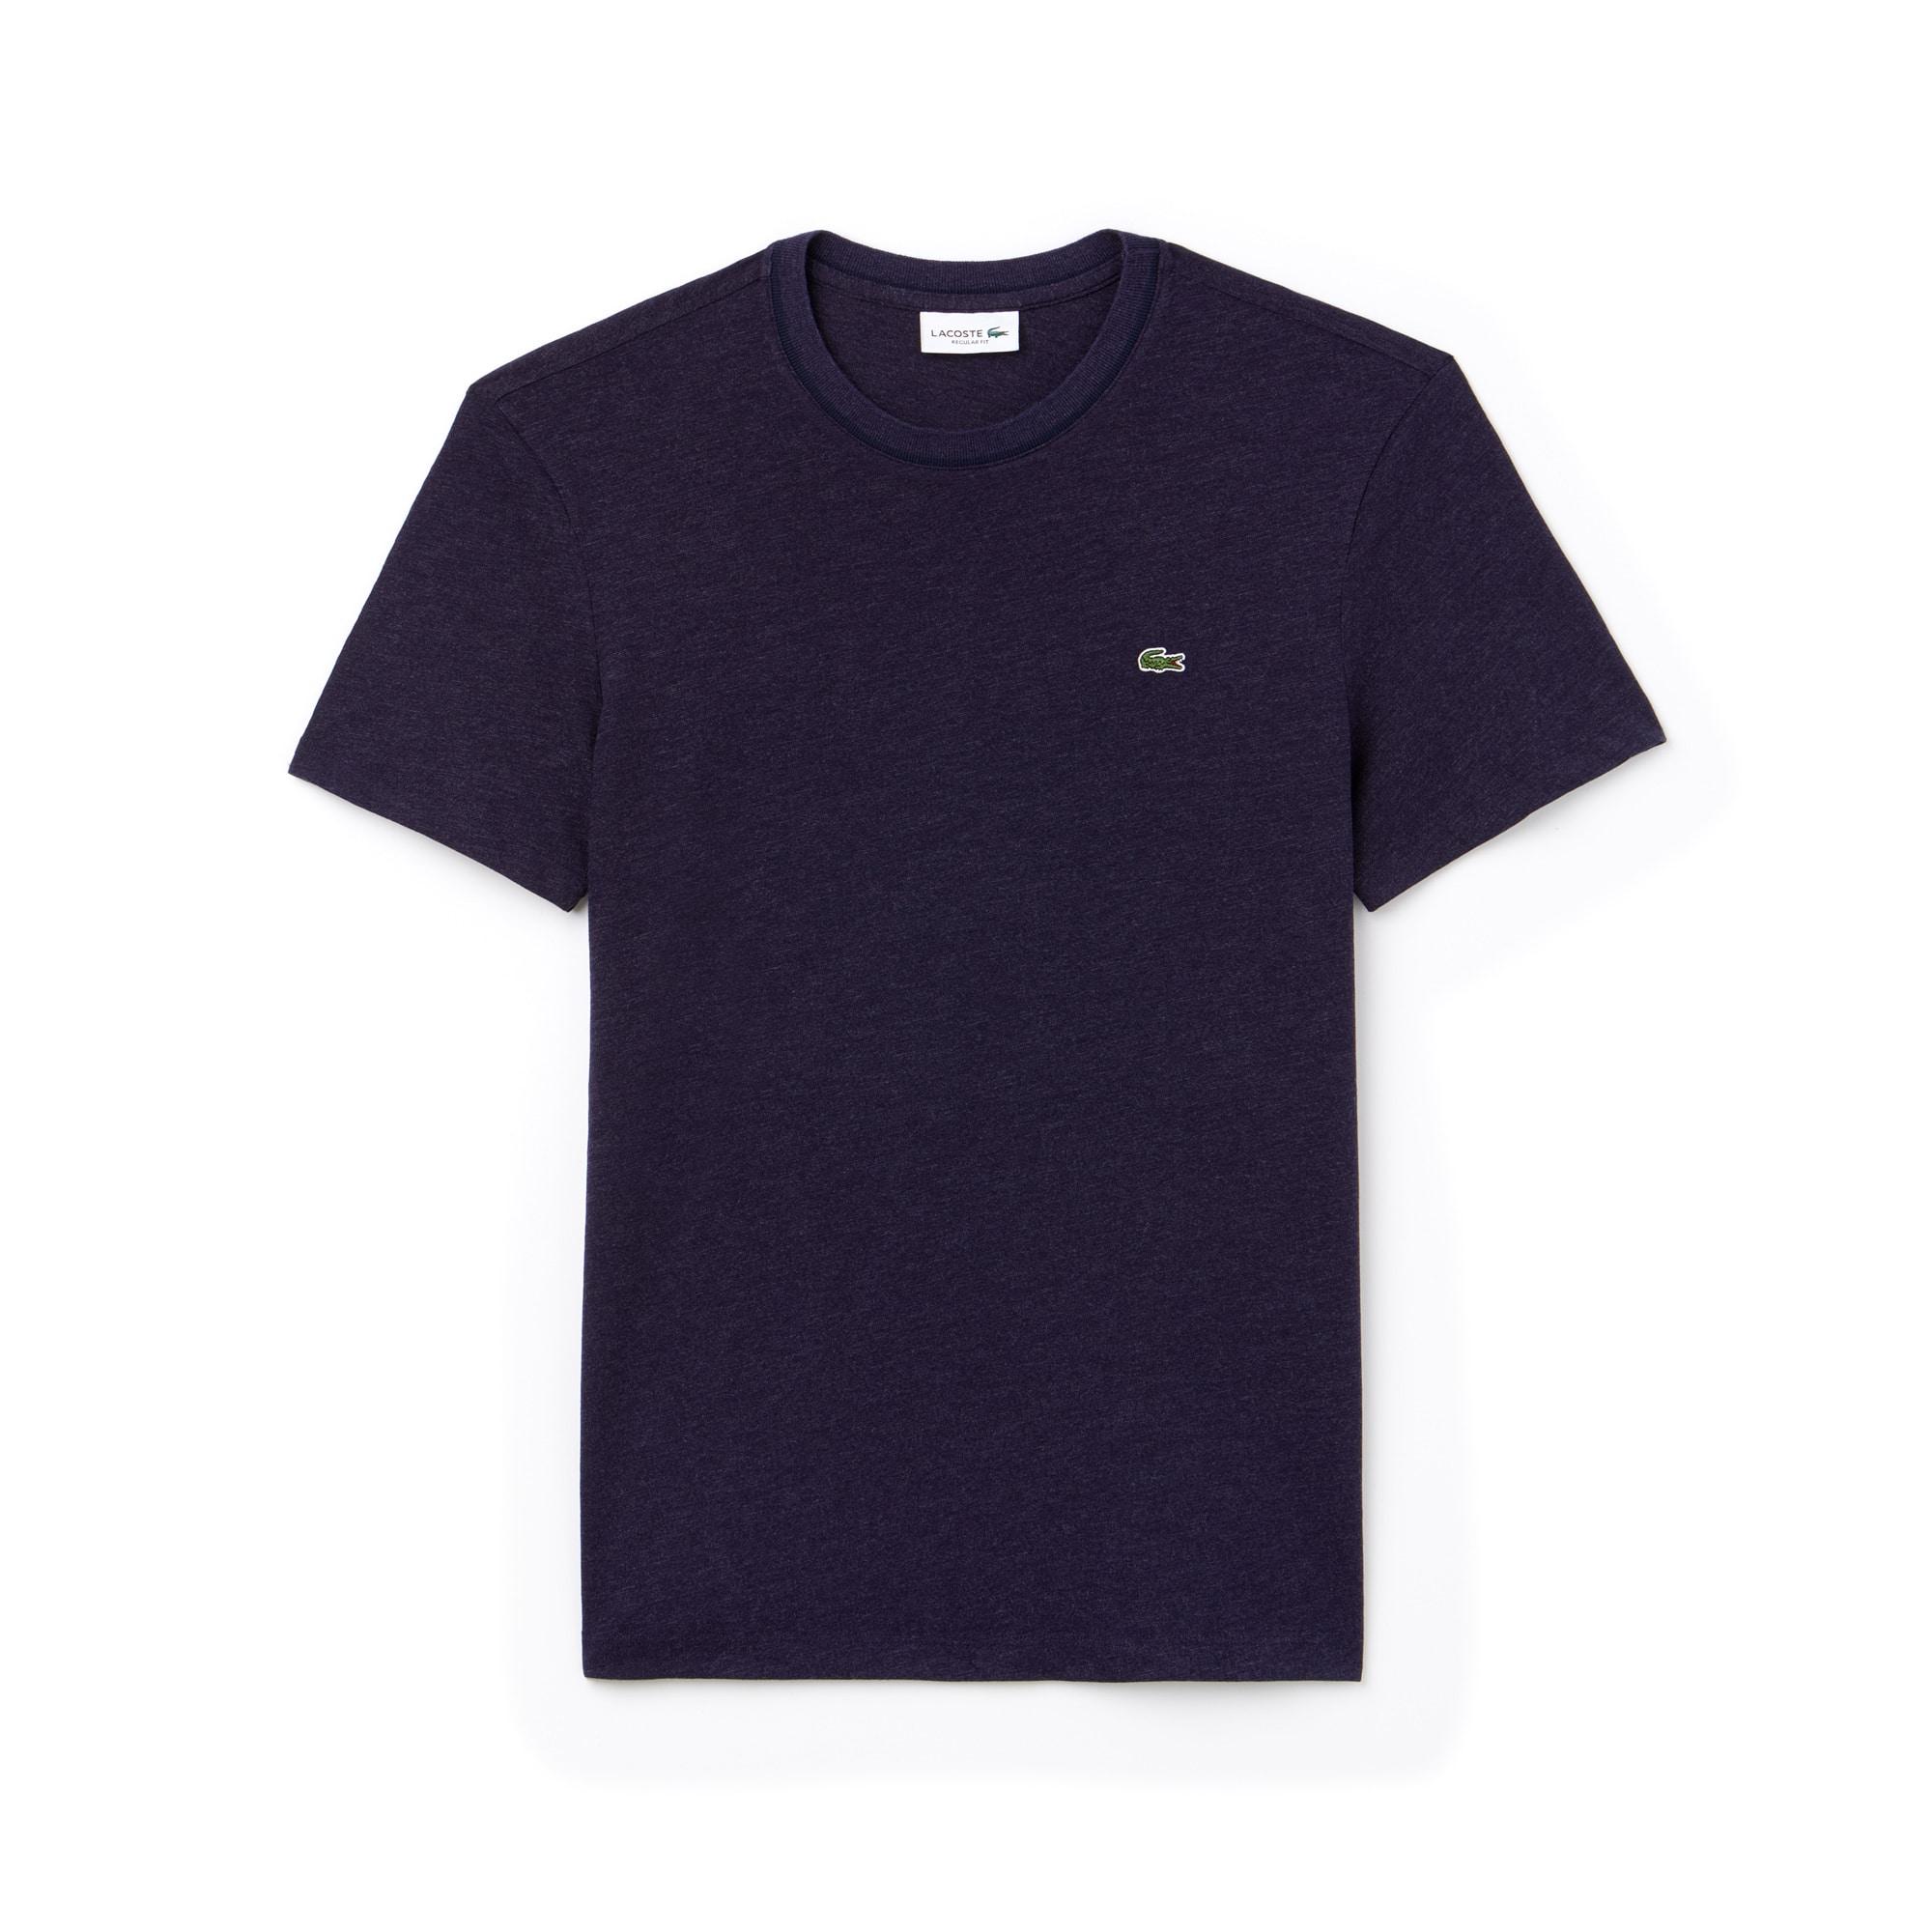 Men's Crew Neck Flamme Cotton Jersey T-shirt